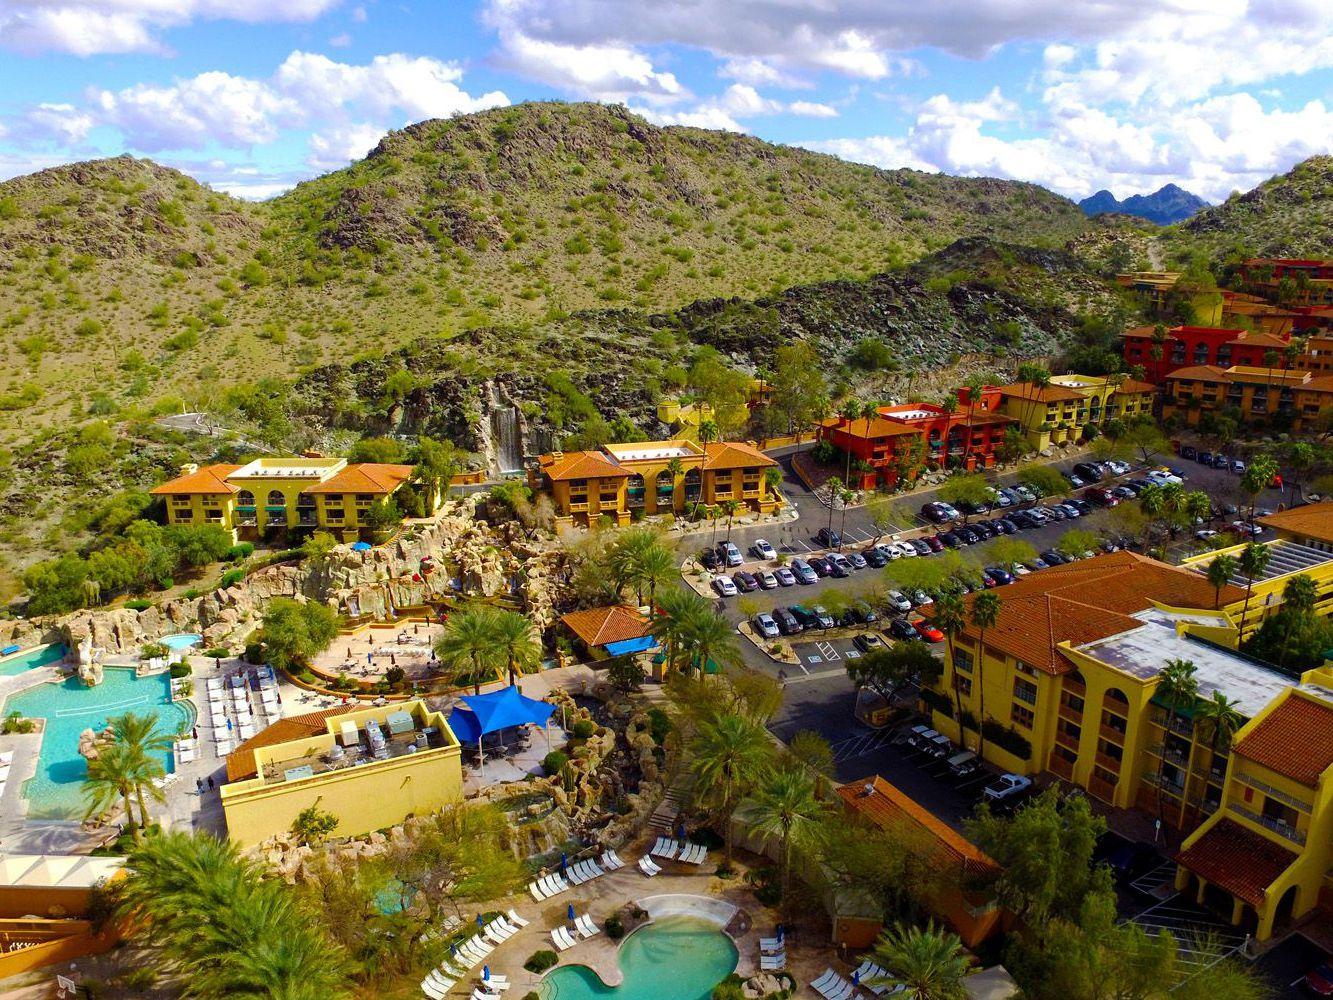 Scottsdale Restaurants With Scenic Views